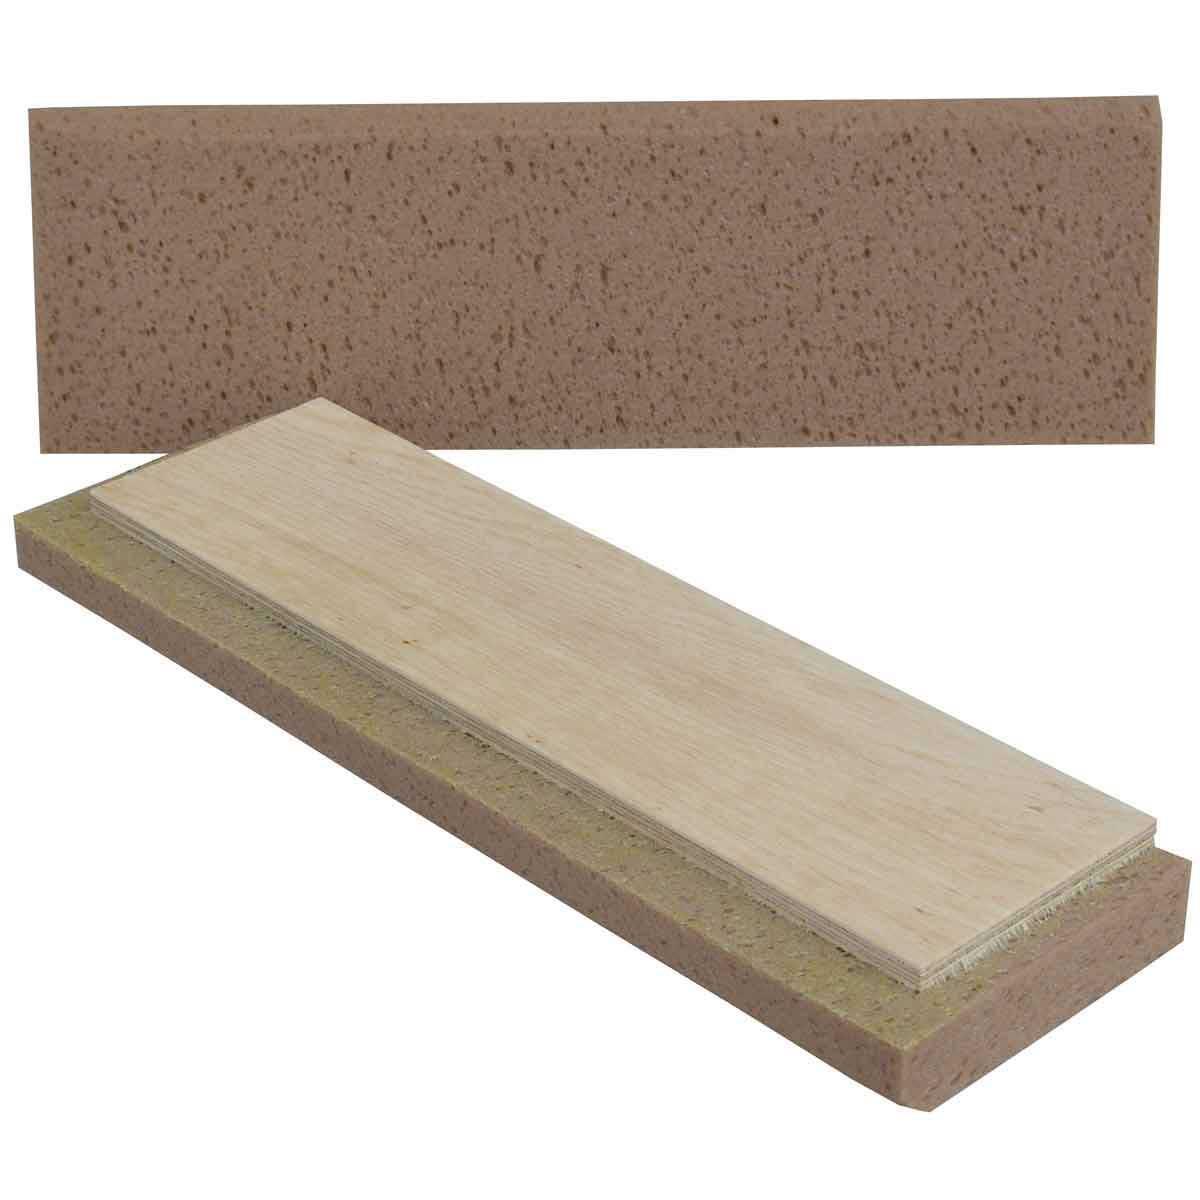 Raimondi Brown Floor Grout Sponge